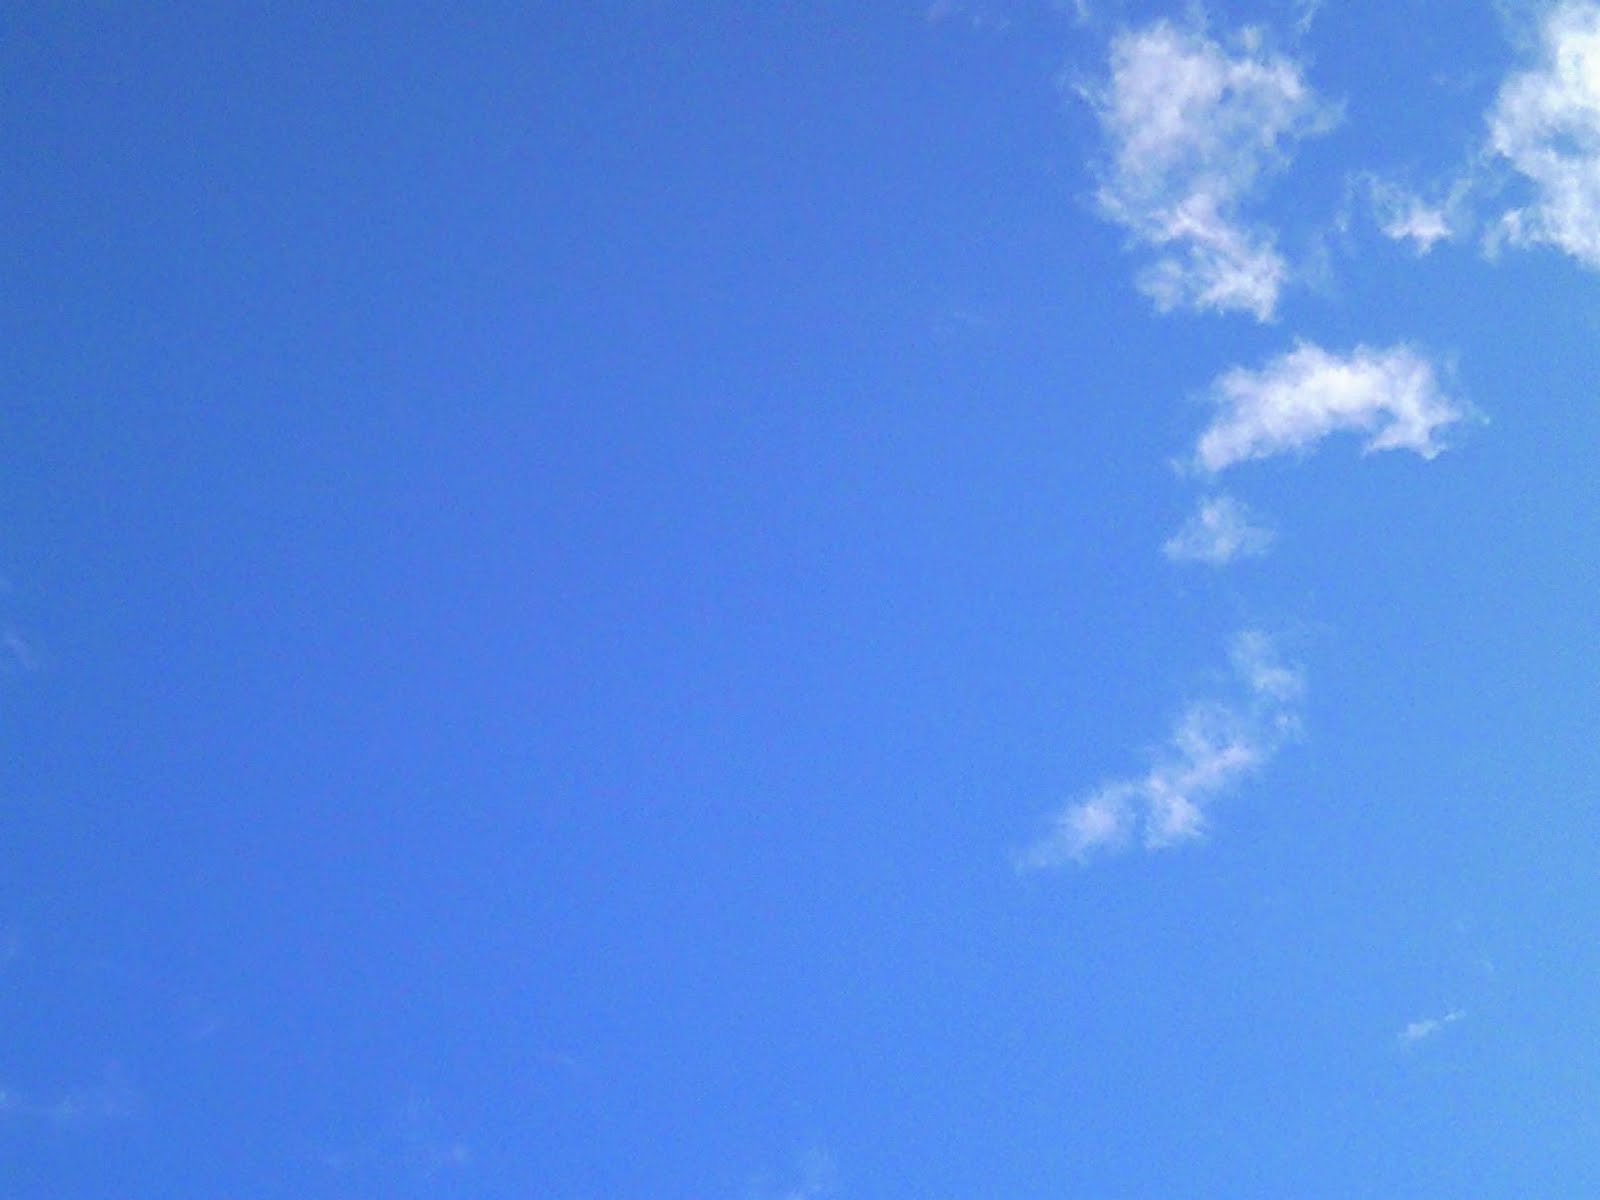 Neko Random: Japanese Words for the Day: Weather